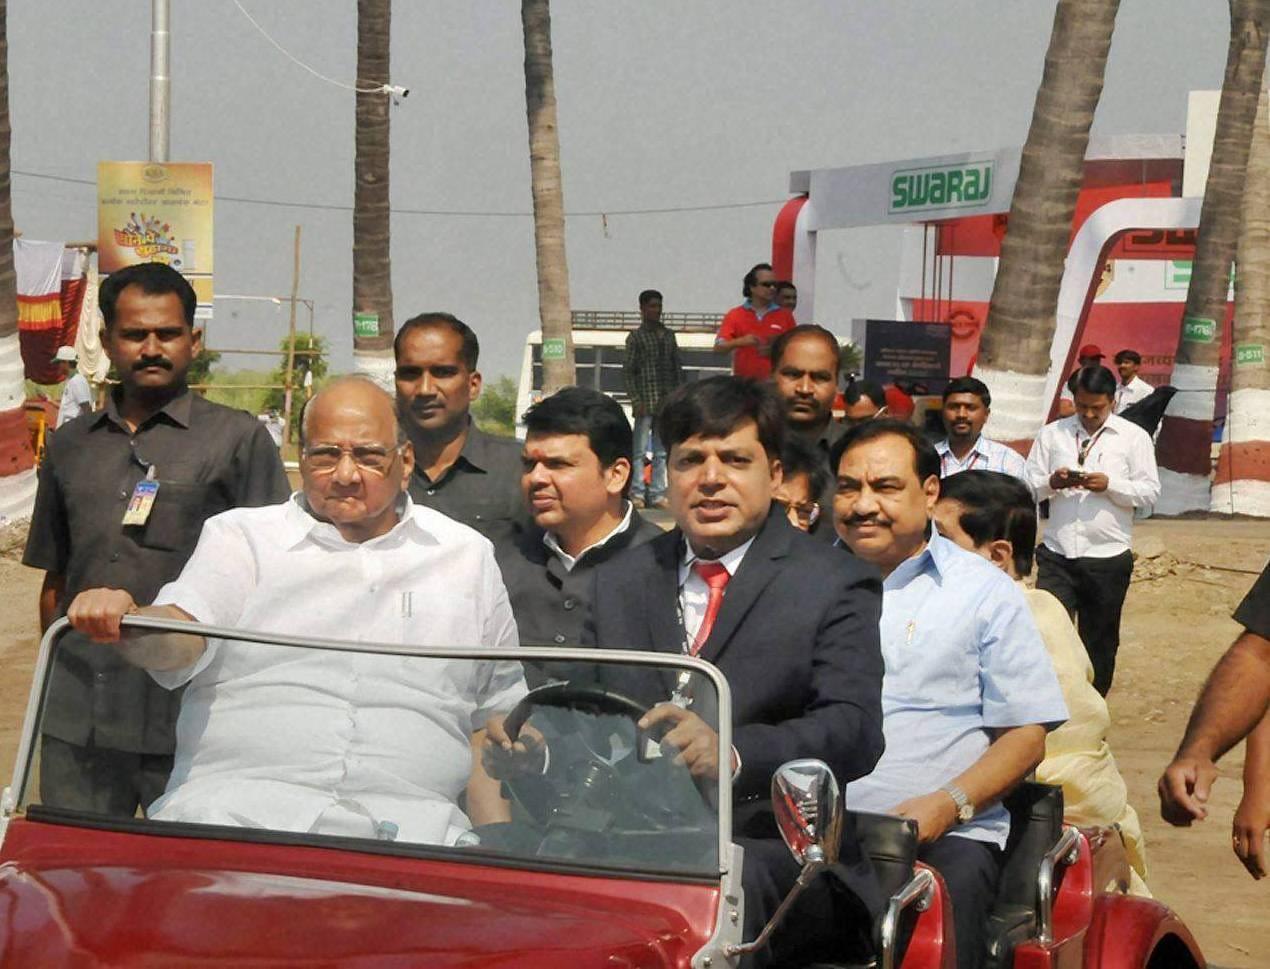 NCP President, Sharad Pawar, Devendra Fadnavis, Agriculture Exhibition in Baramati, Maharashtra